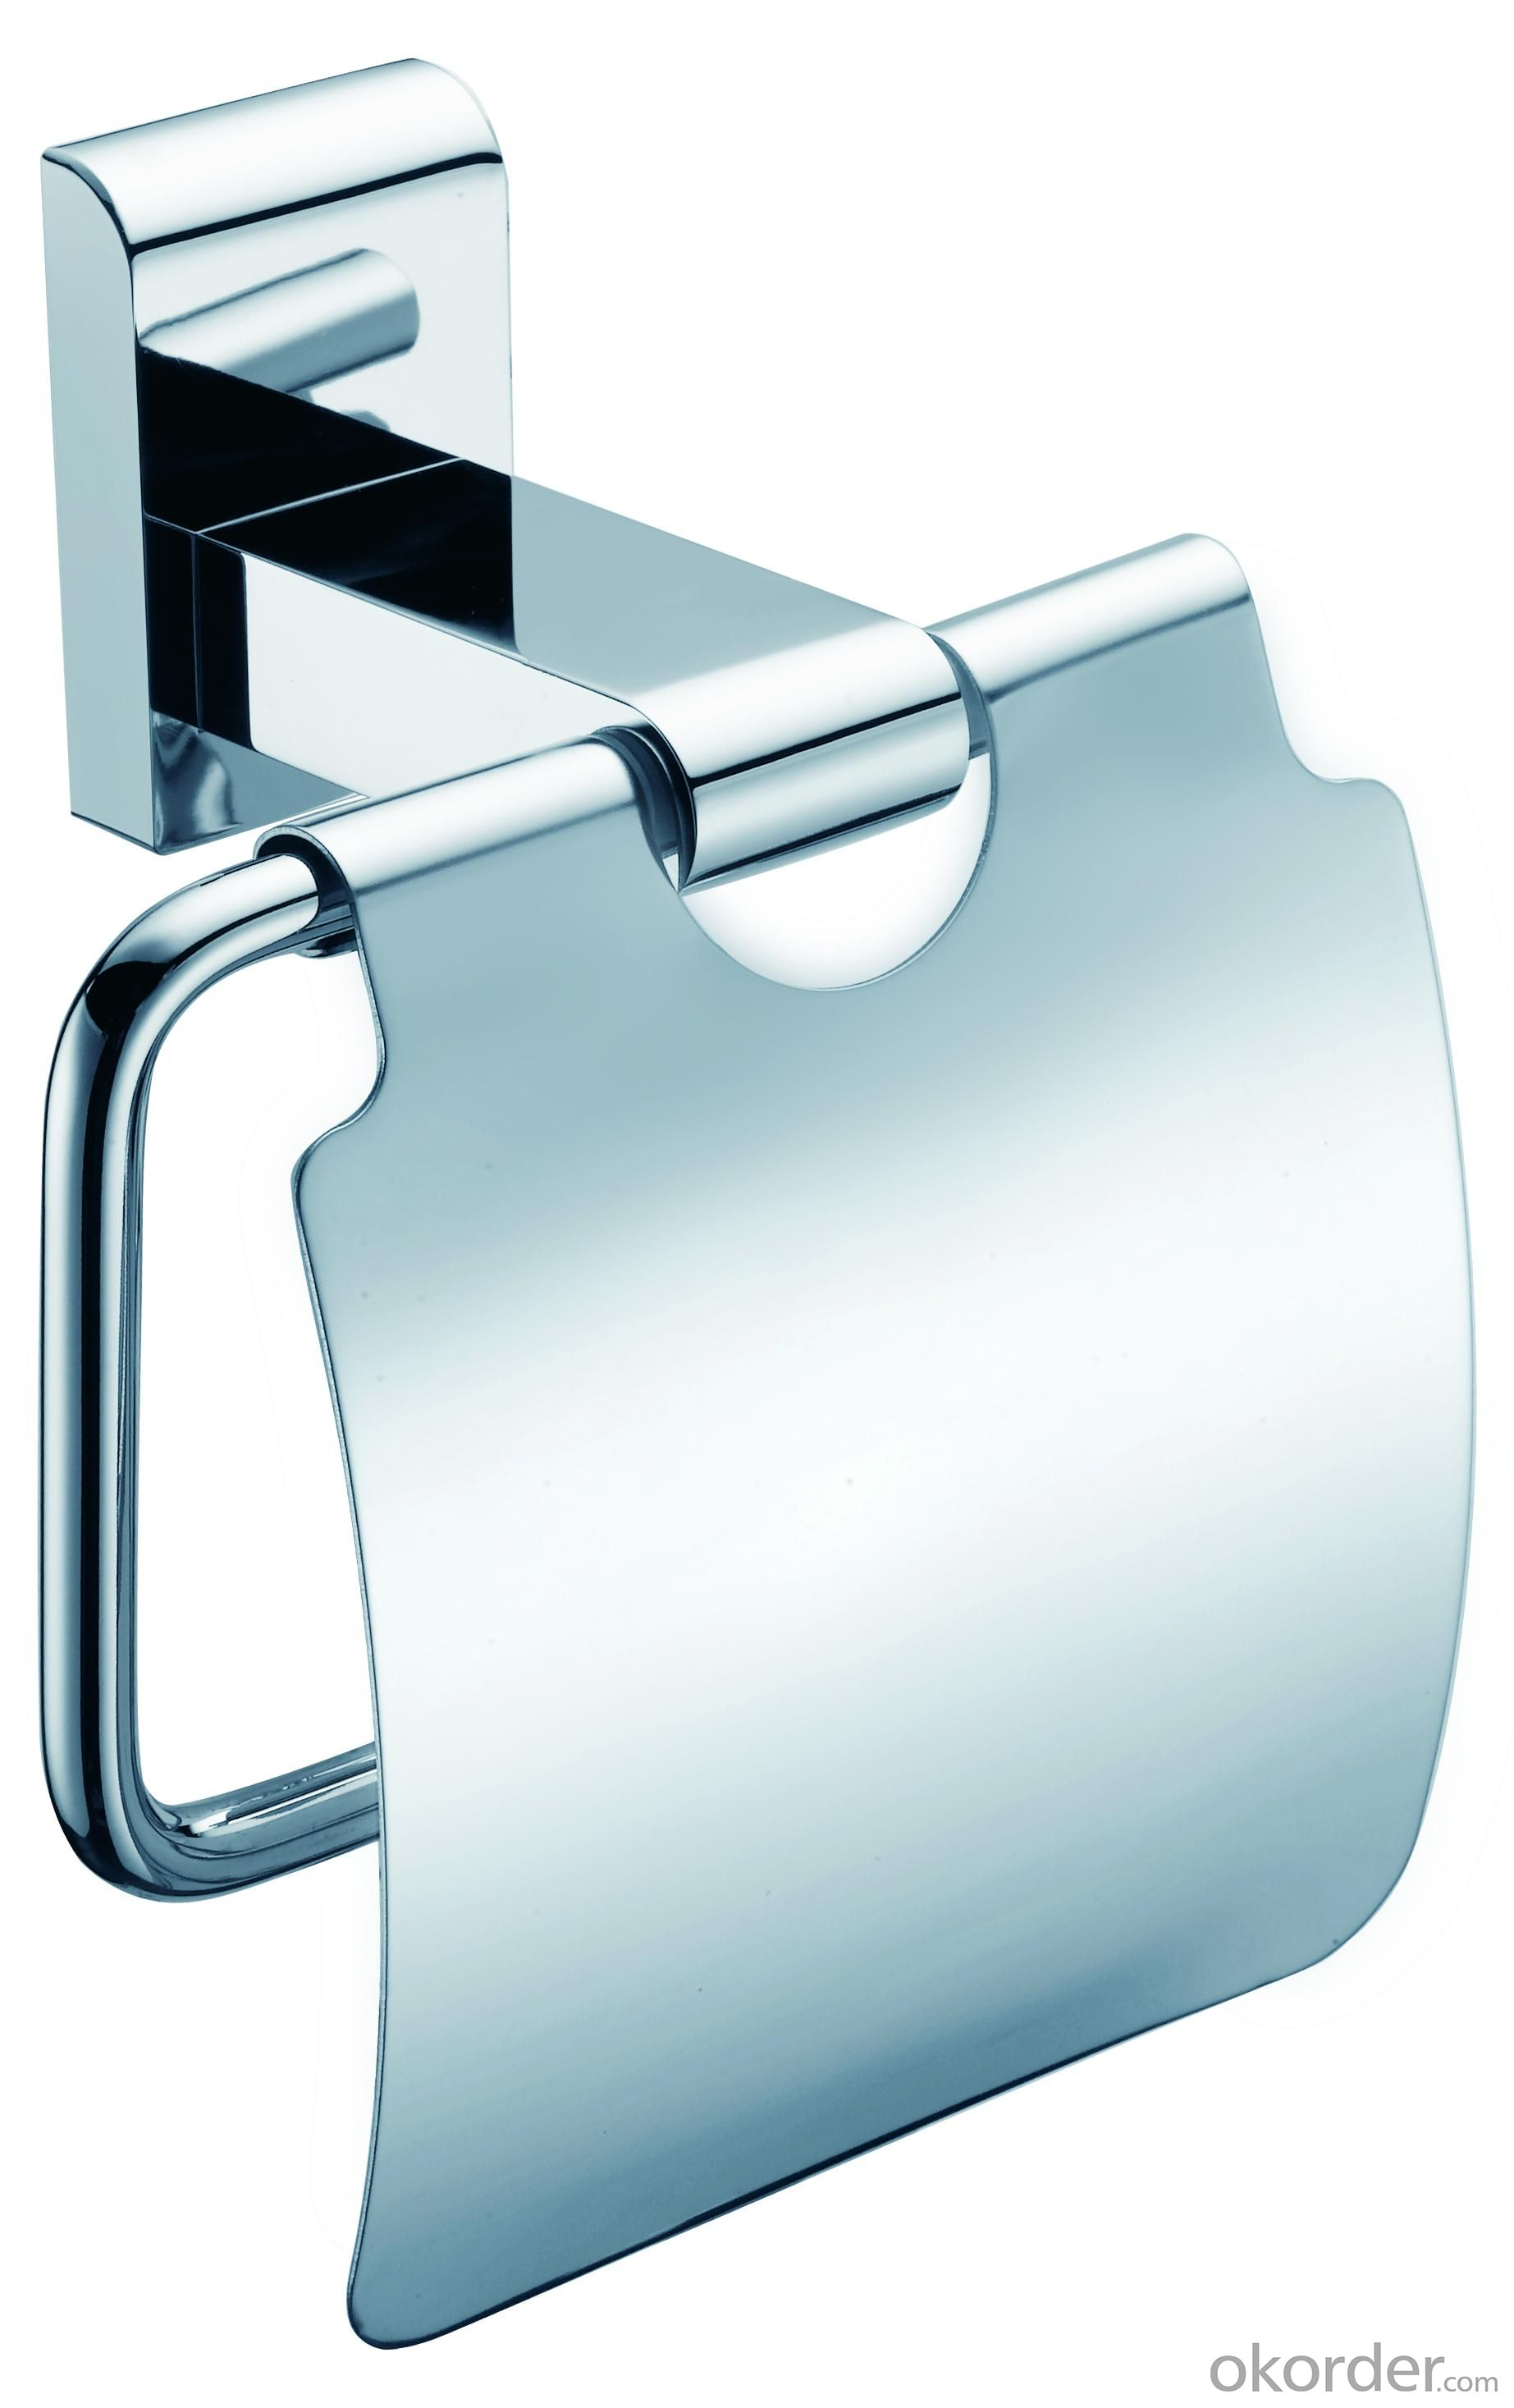 Decorative Organize Exquisite Bathroom Accessories Solid Brass Roll Holder